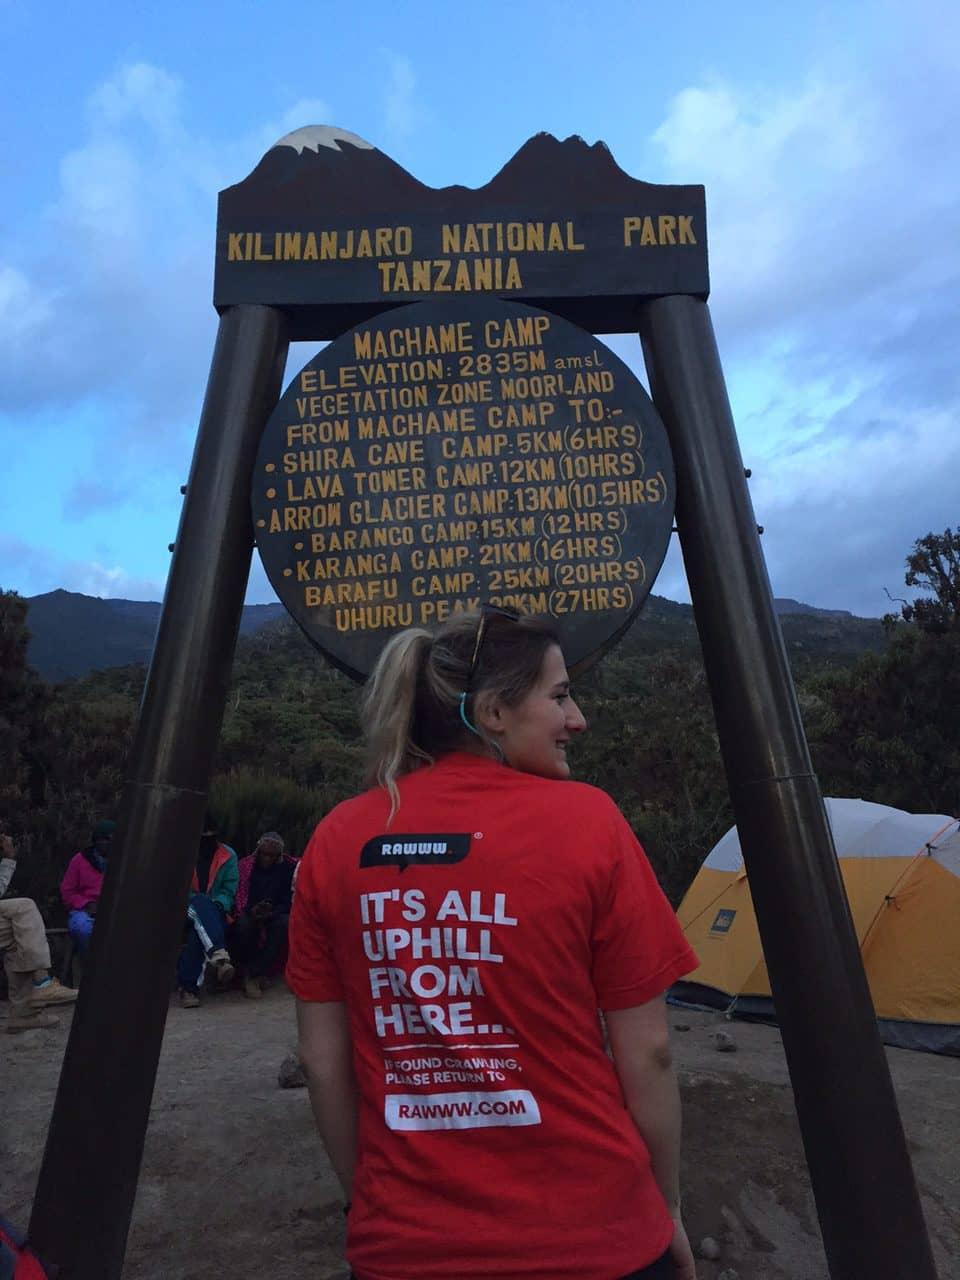 Fred's Kilimanjaro Journey 2